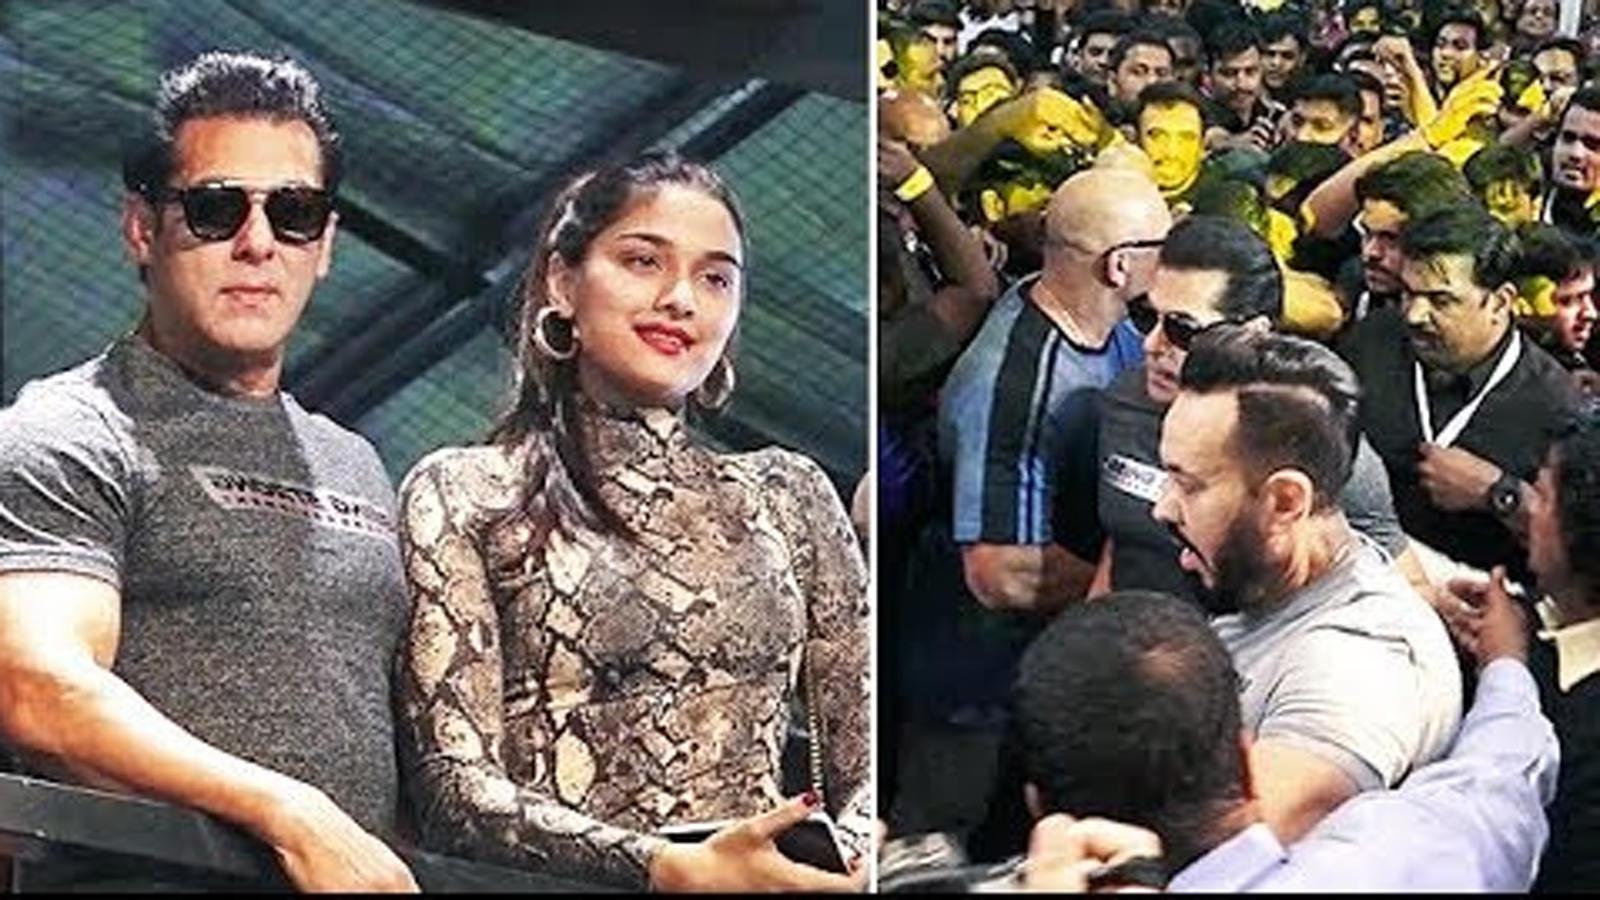 salman-khan-and-saiee-manjrekar-mobbed-by-unruly-crowd